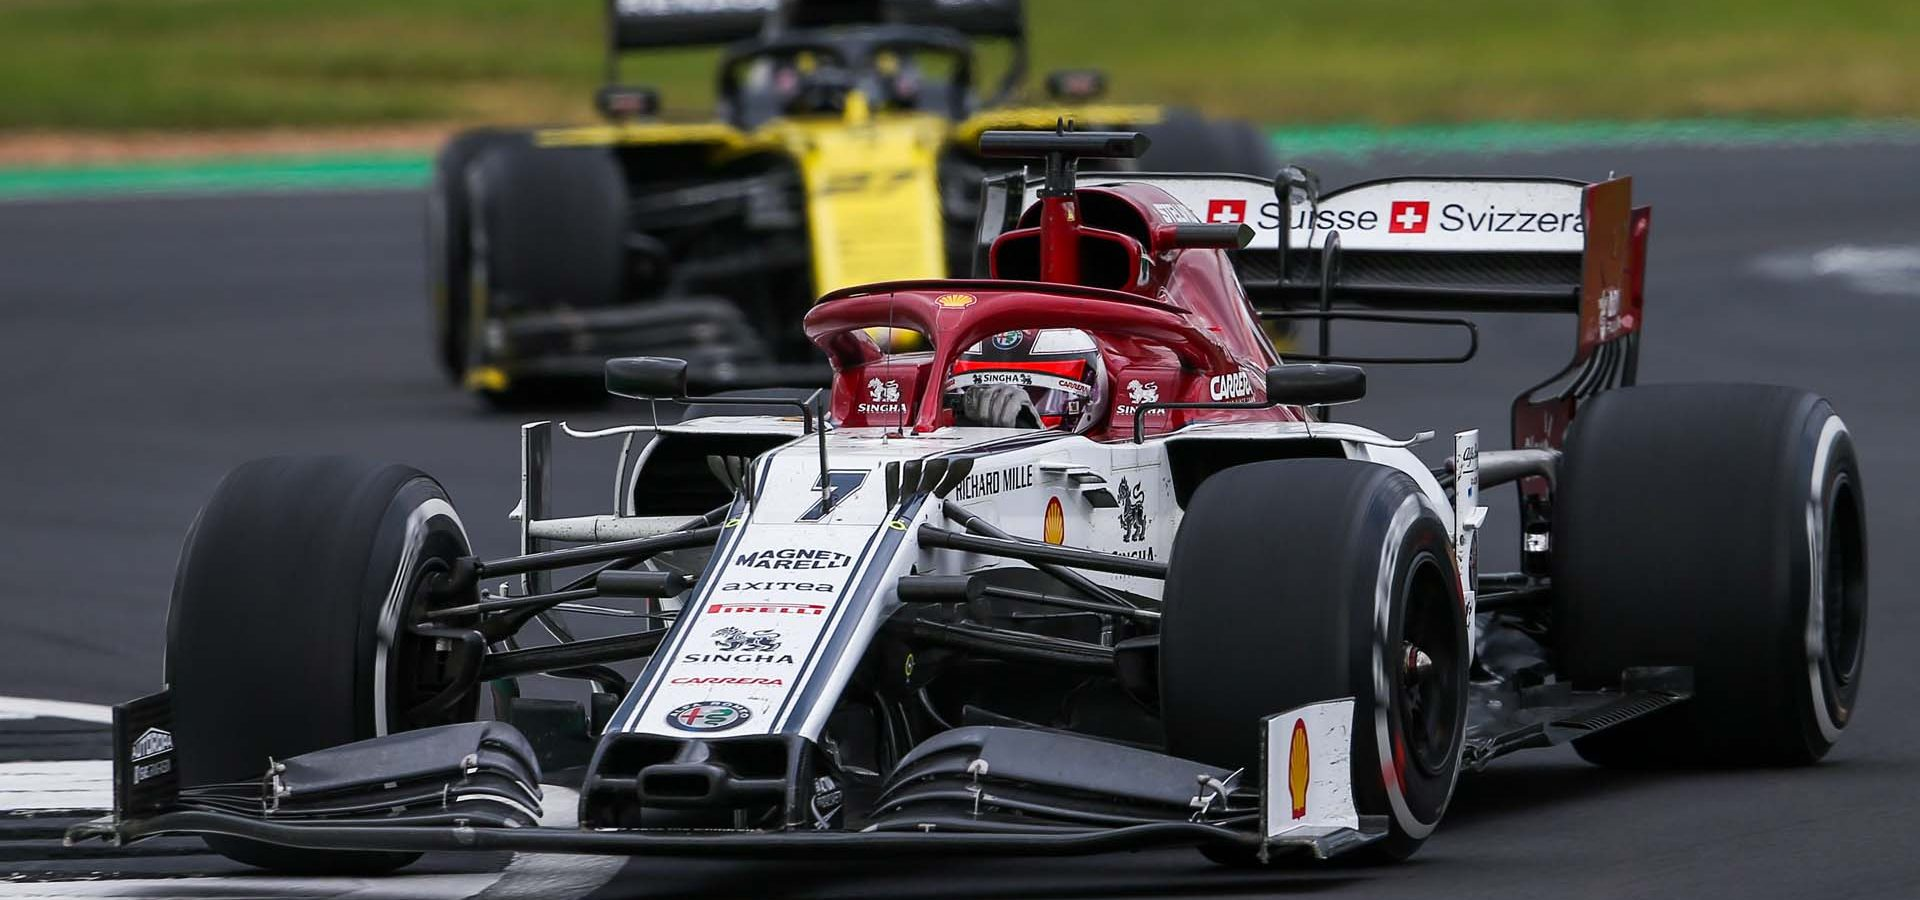 07 RAIKKONEN Räikkönen Kimi (fin), Alfa Romeo Racing C38, action during the 2019 Formula One World Championship, Grand Prix of England from july 11 to 14,  in Silverstone, Great Britain - Photo Antonin Vincent / DPPI